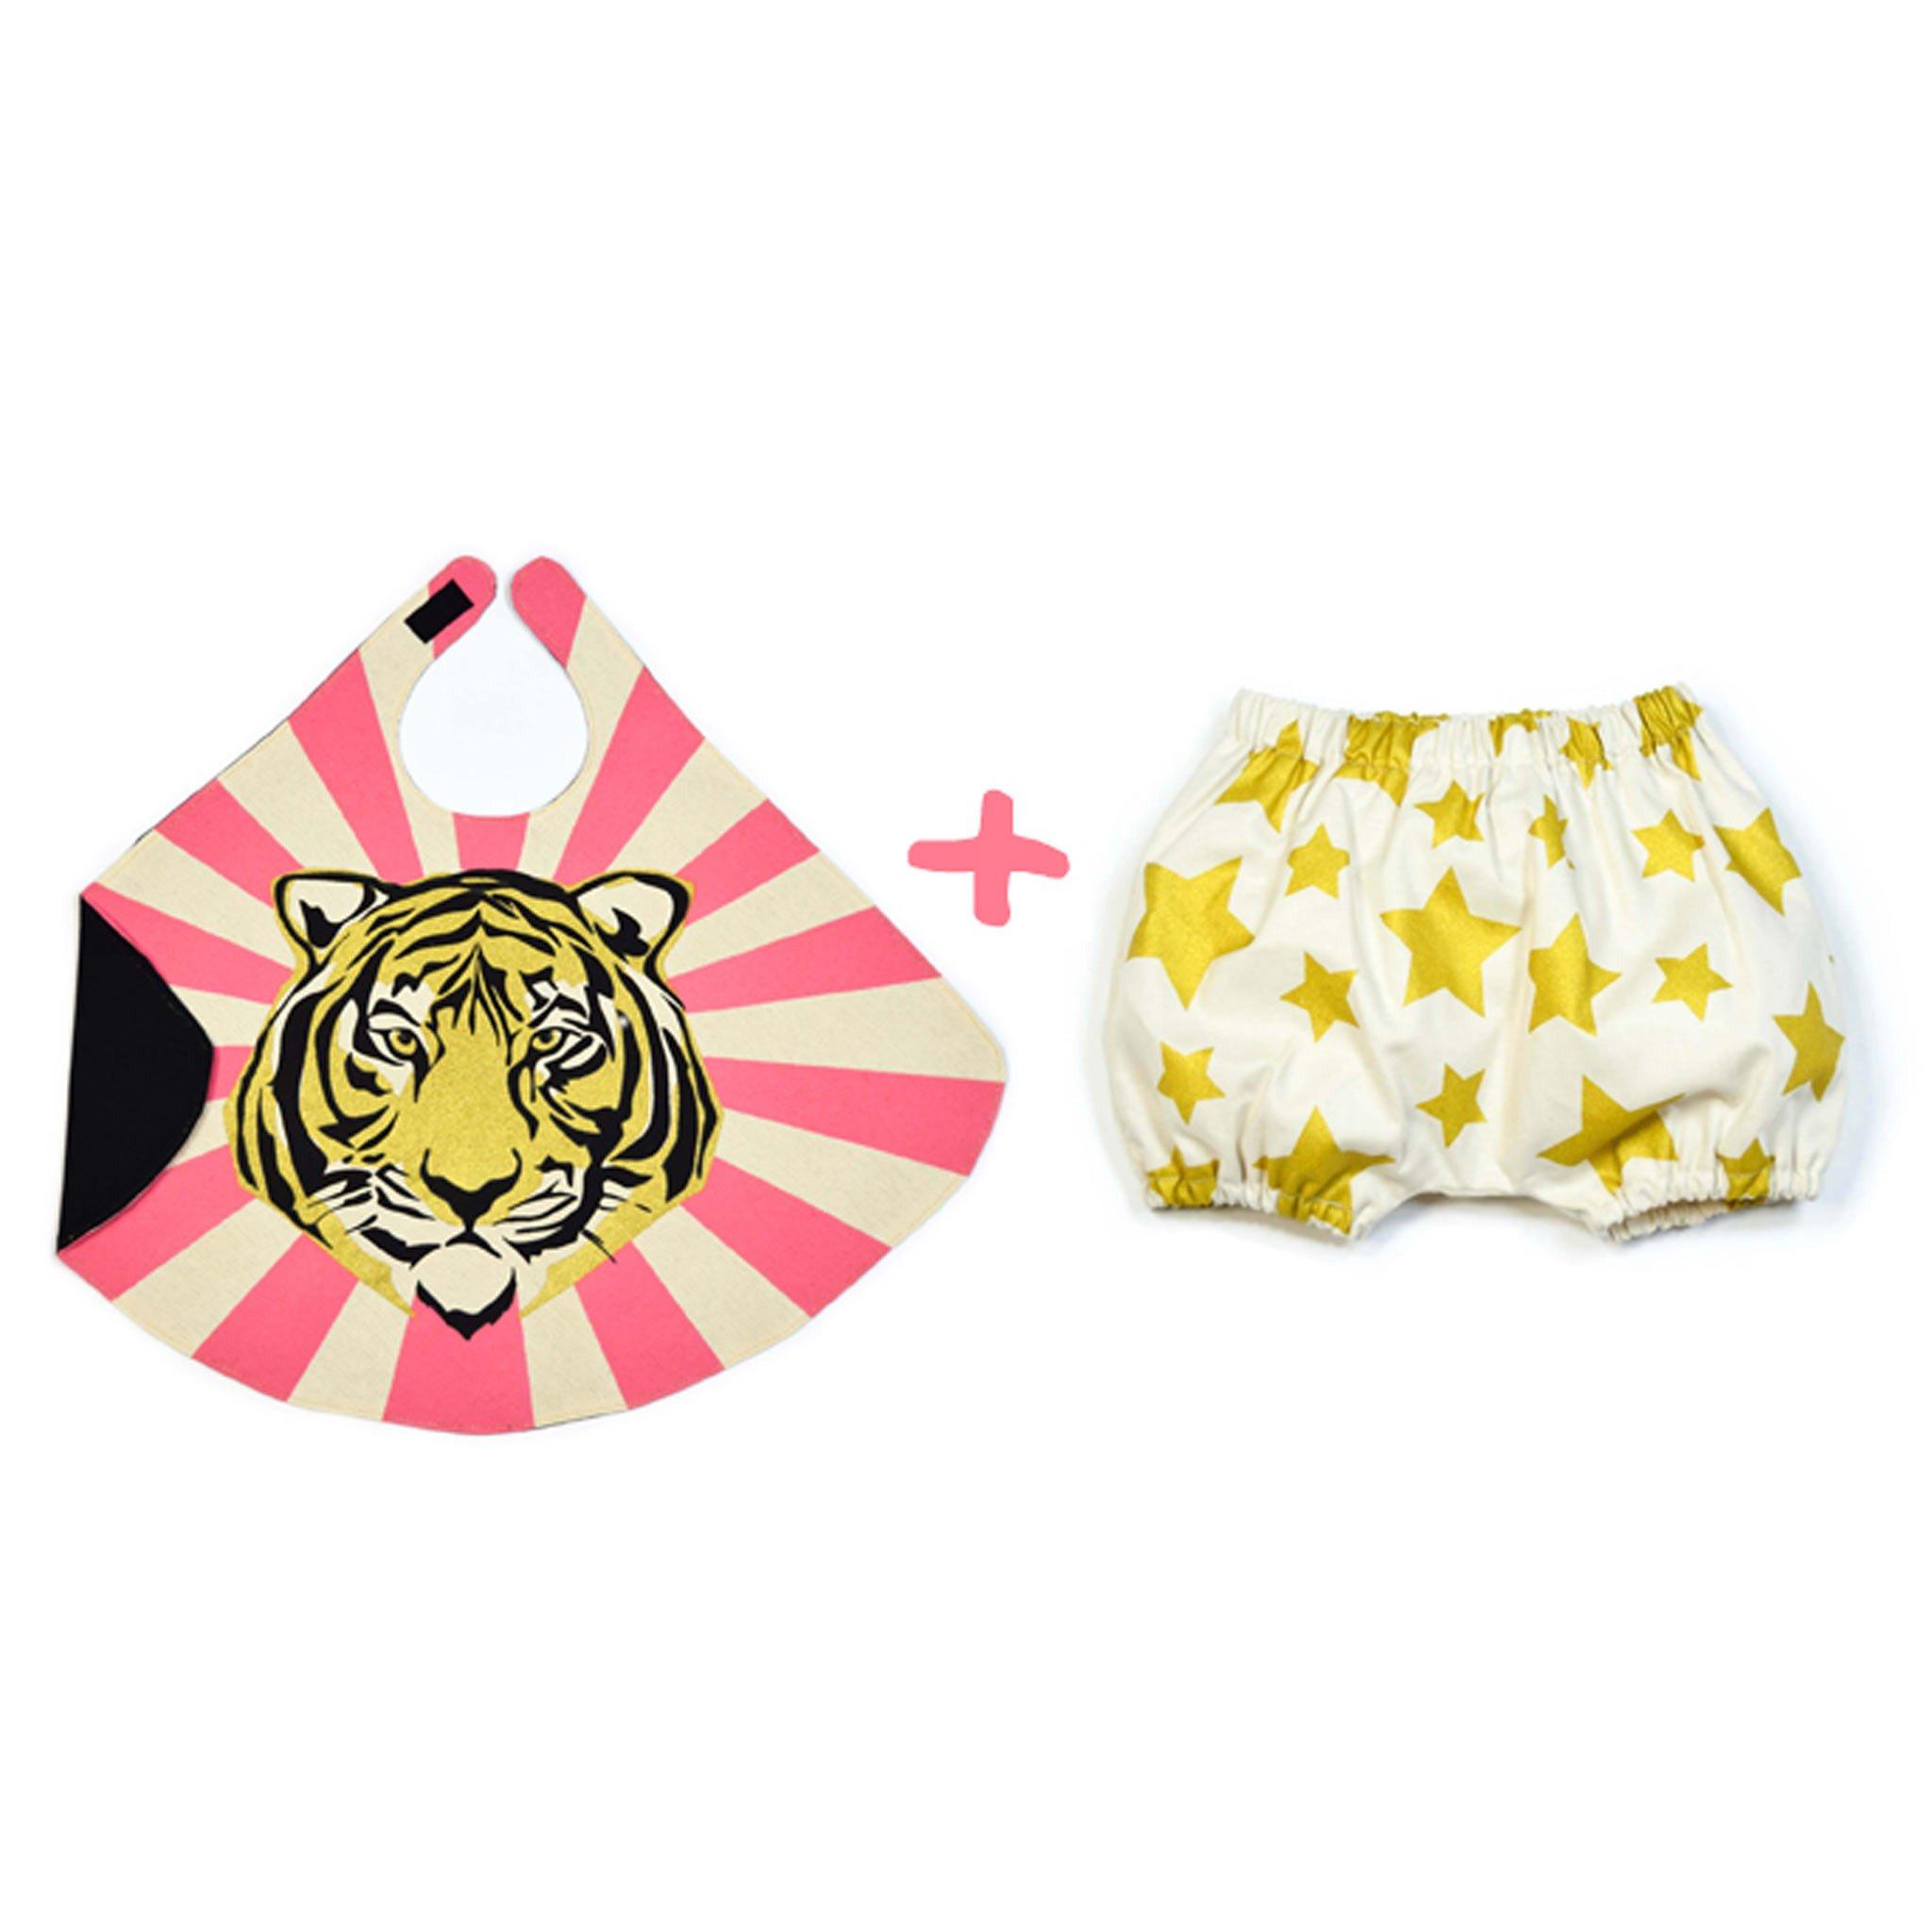 Love Lane Pink Baby Tiger Cape and Bloomer Set, $55-.jpg